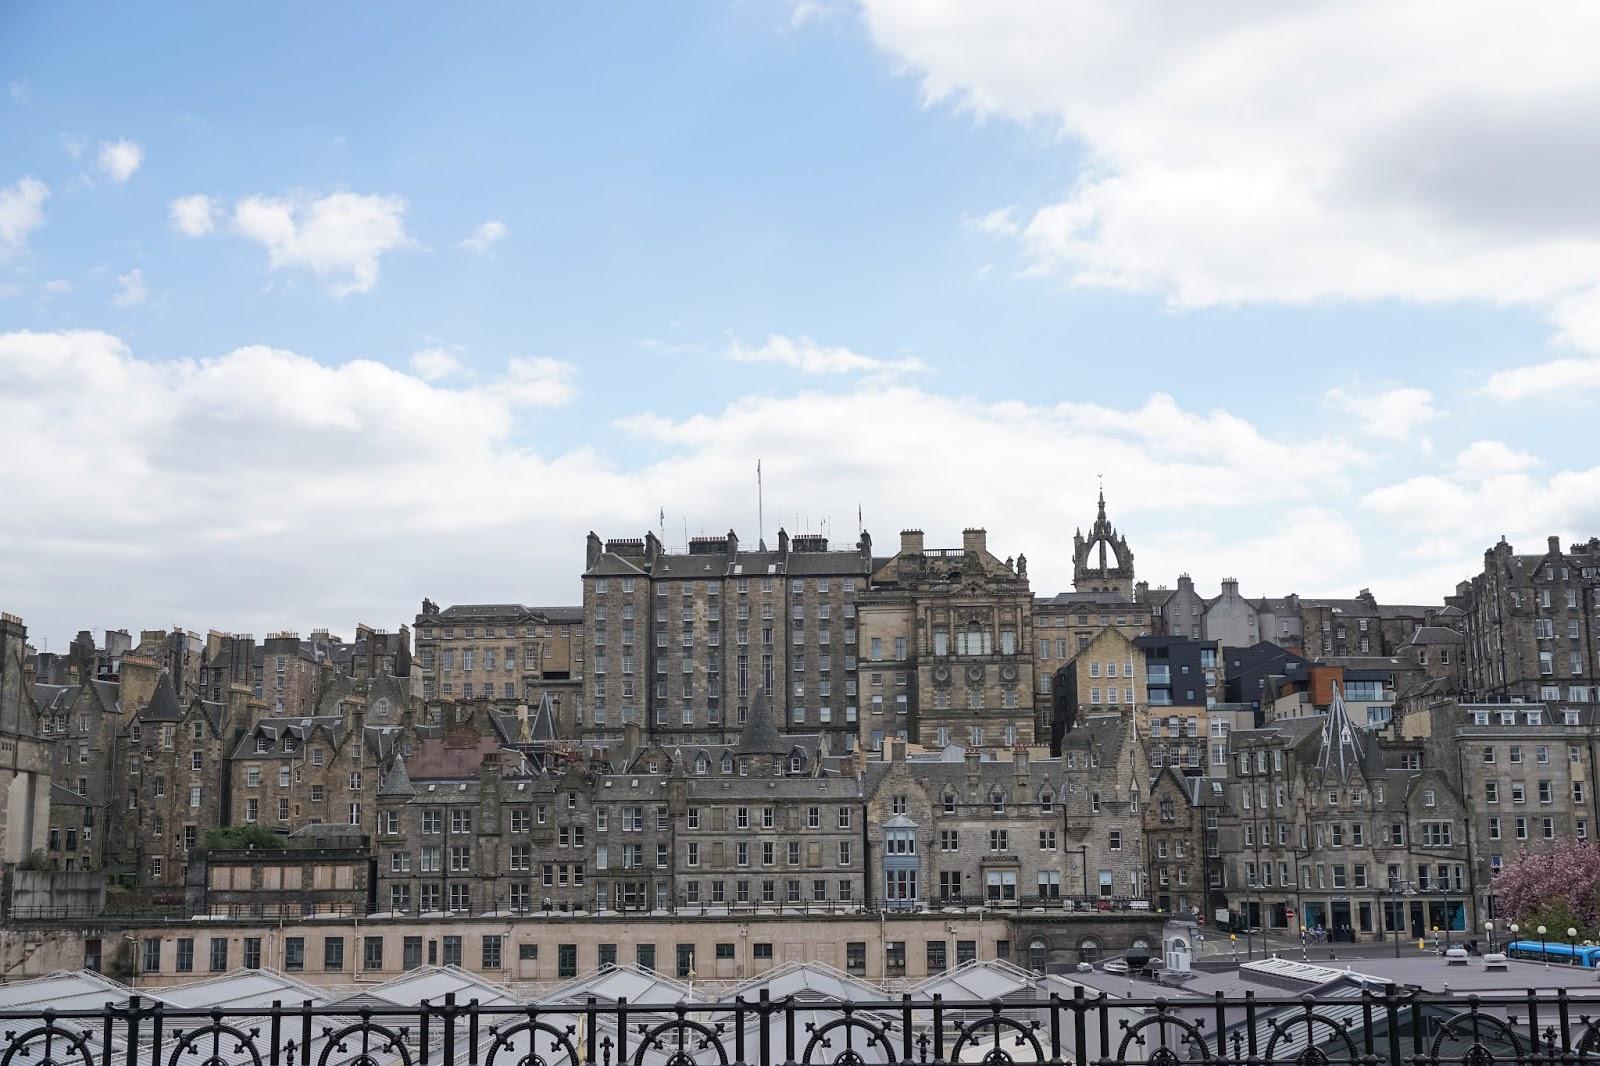 Edinburgh rooftops